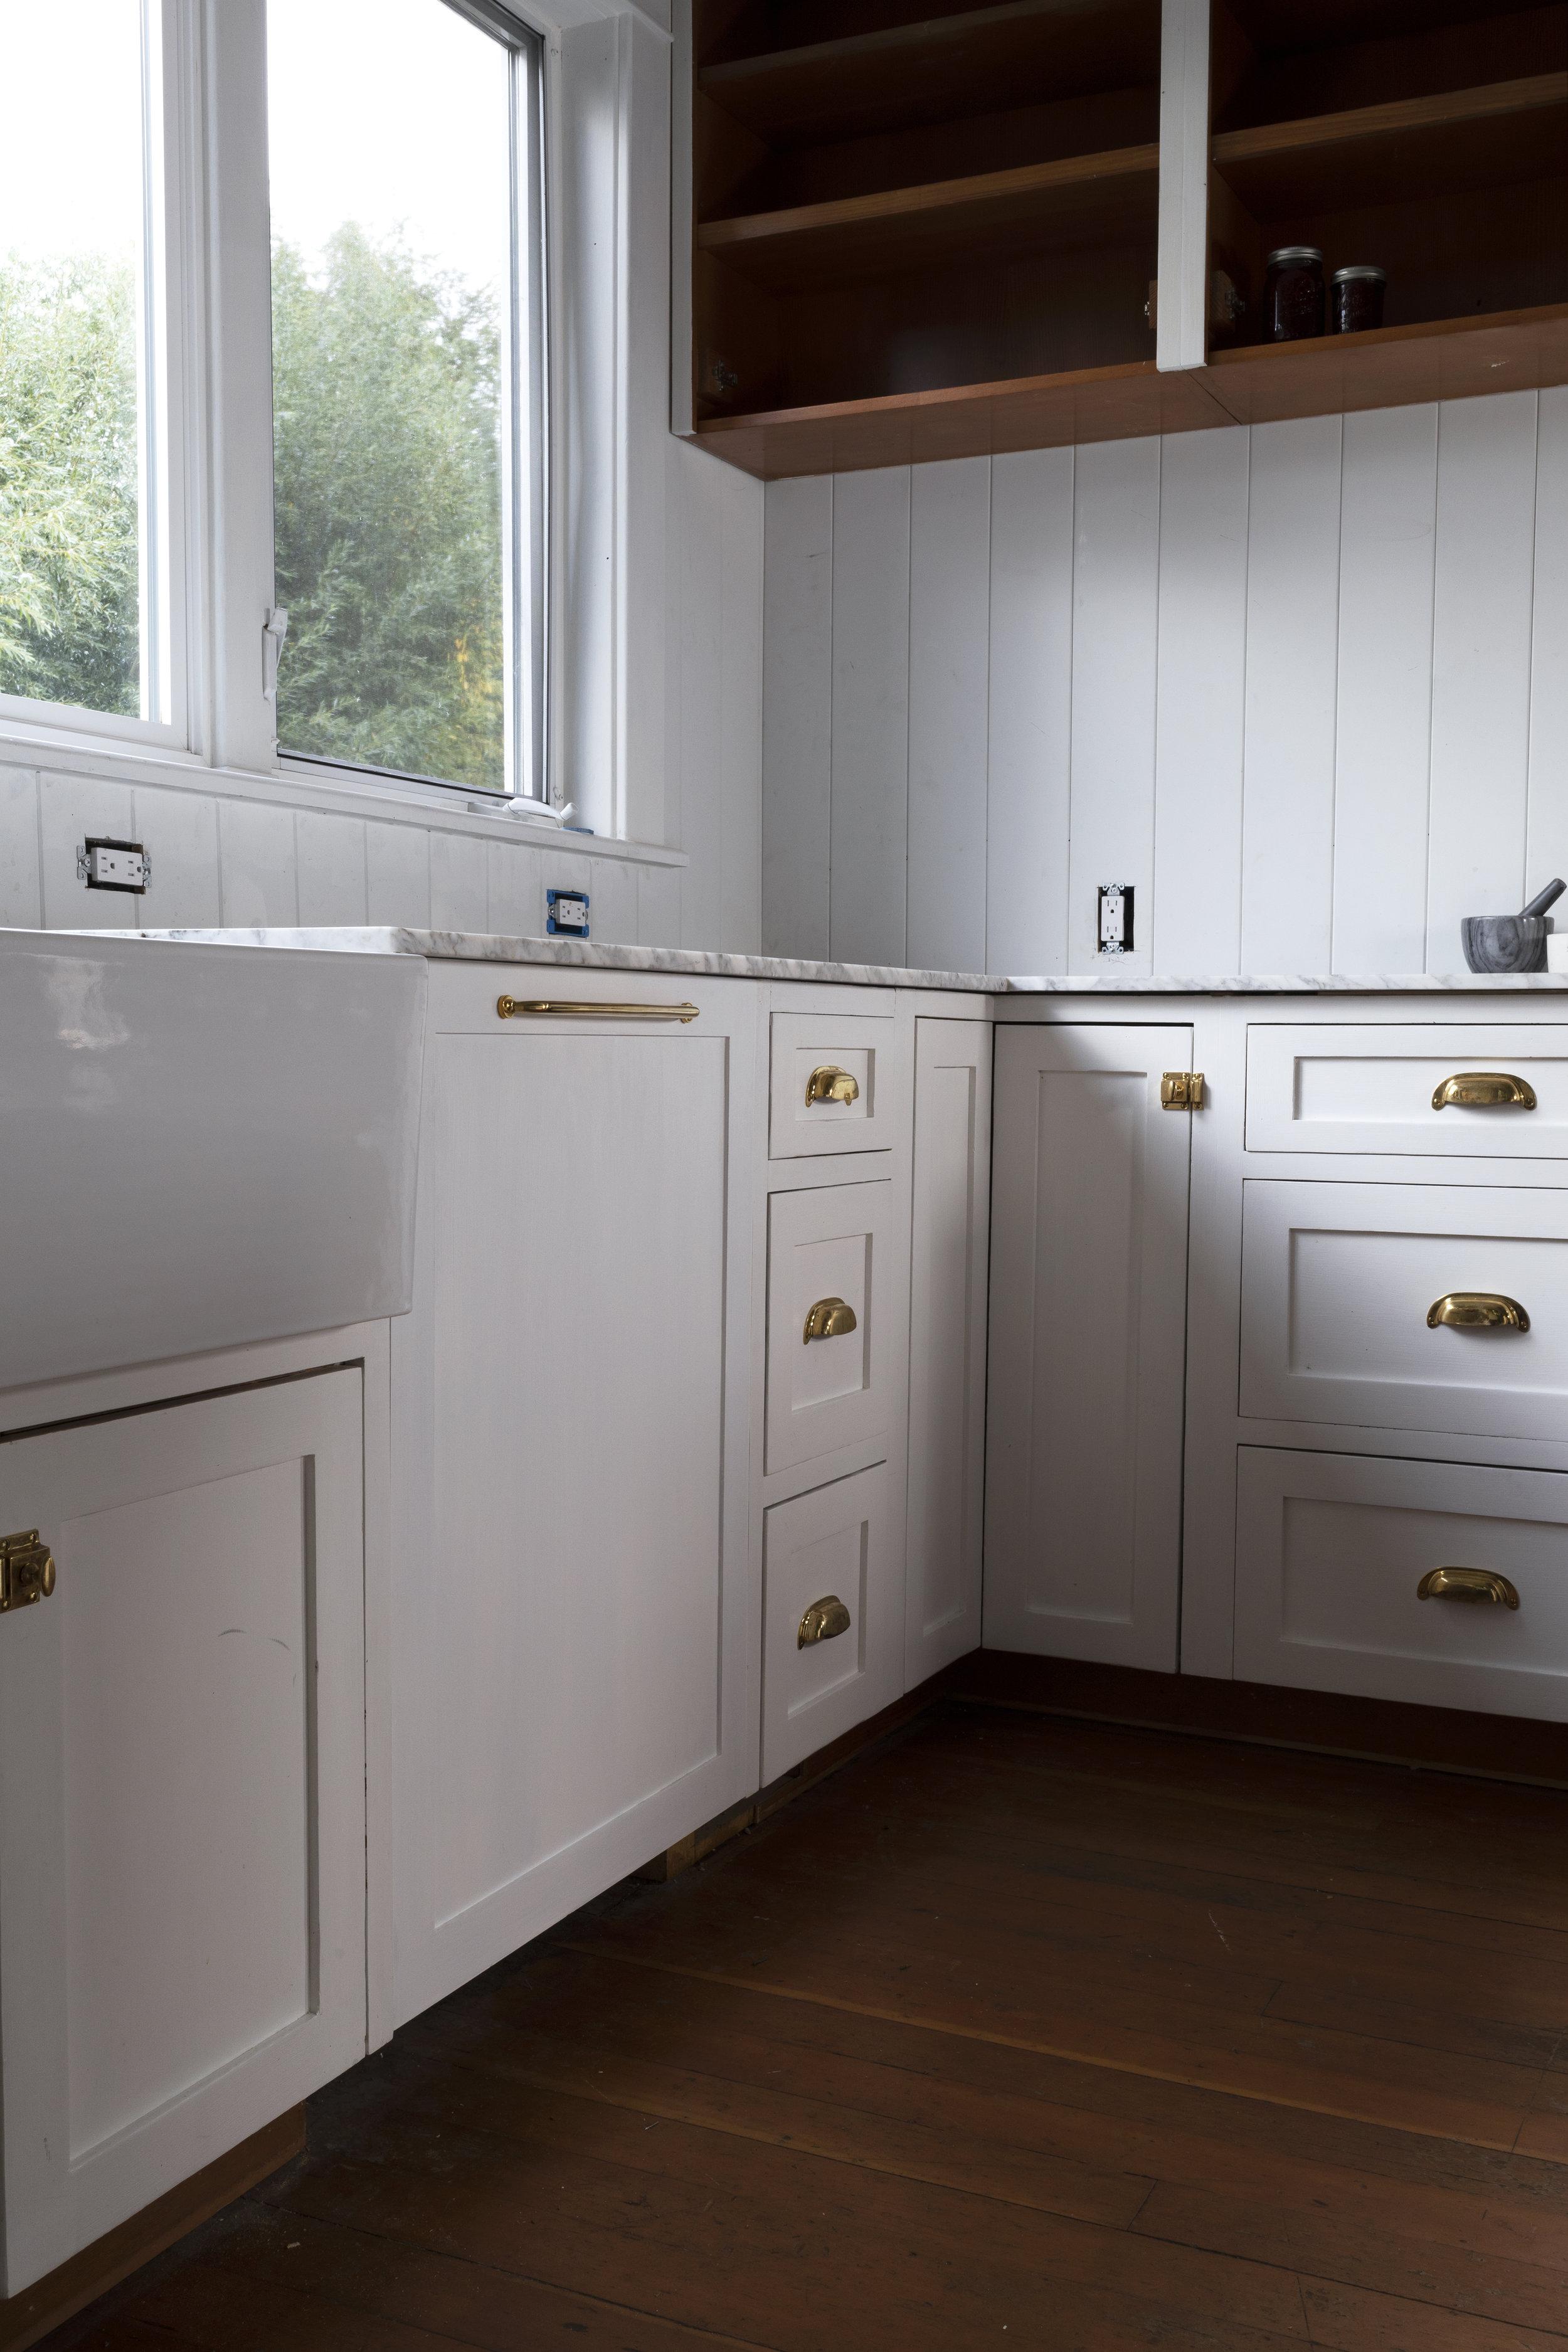 The Grit and Polish - Panel Ready Dishwasher 1.jpg